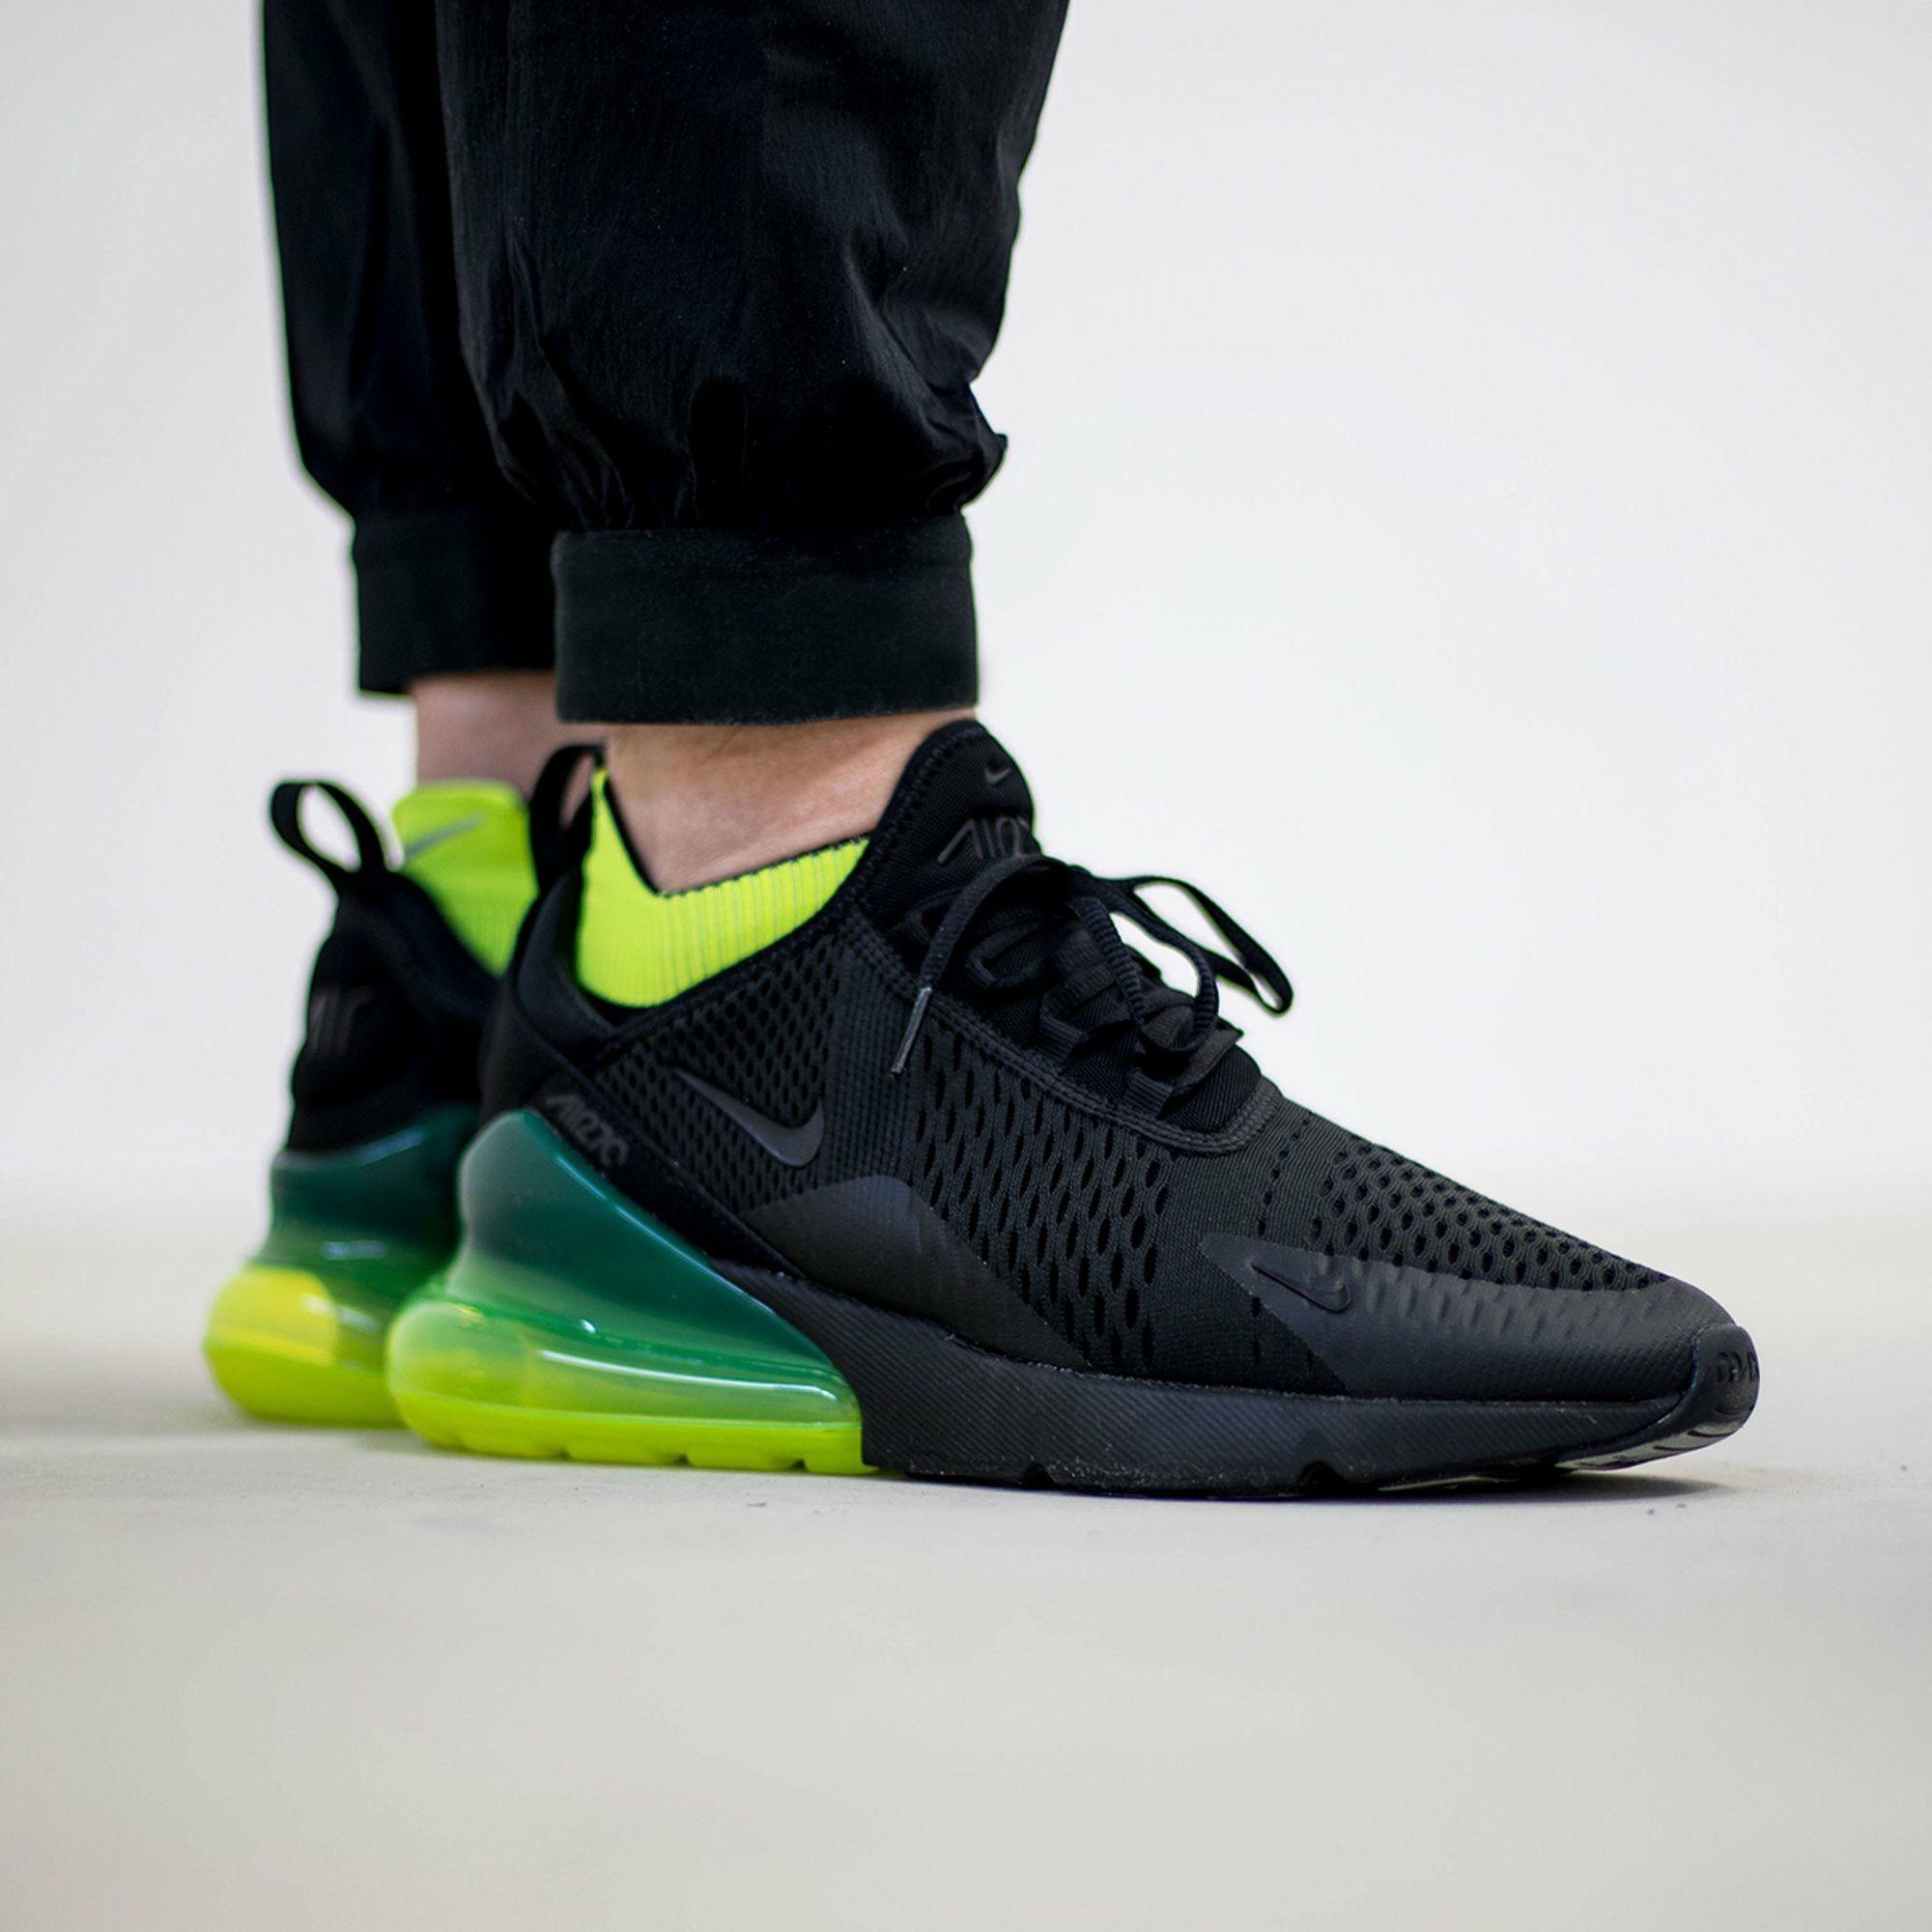 Nike Air Max 270 | Nike air max, Nike, Nike air